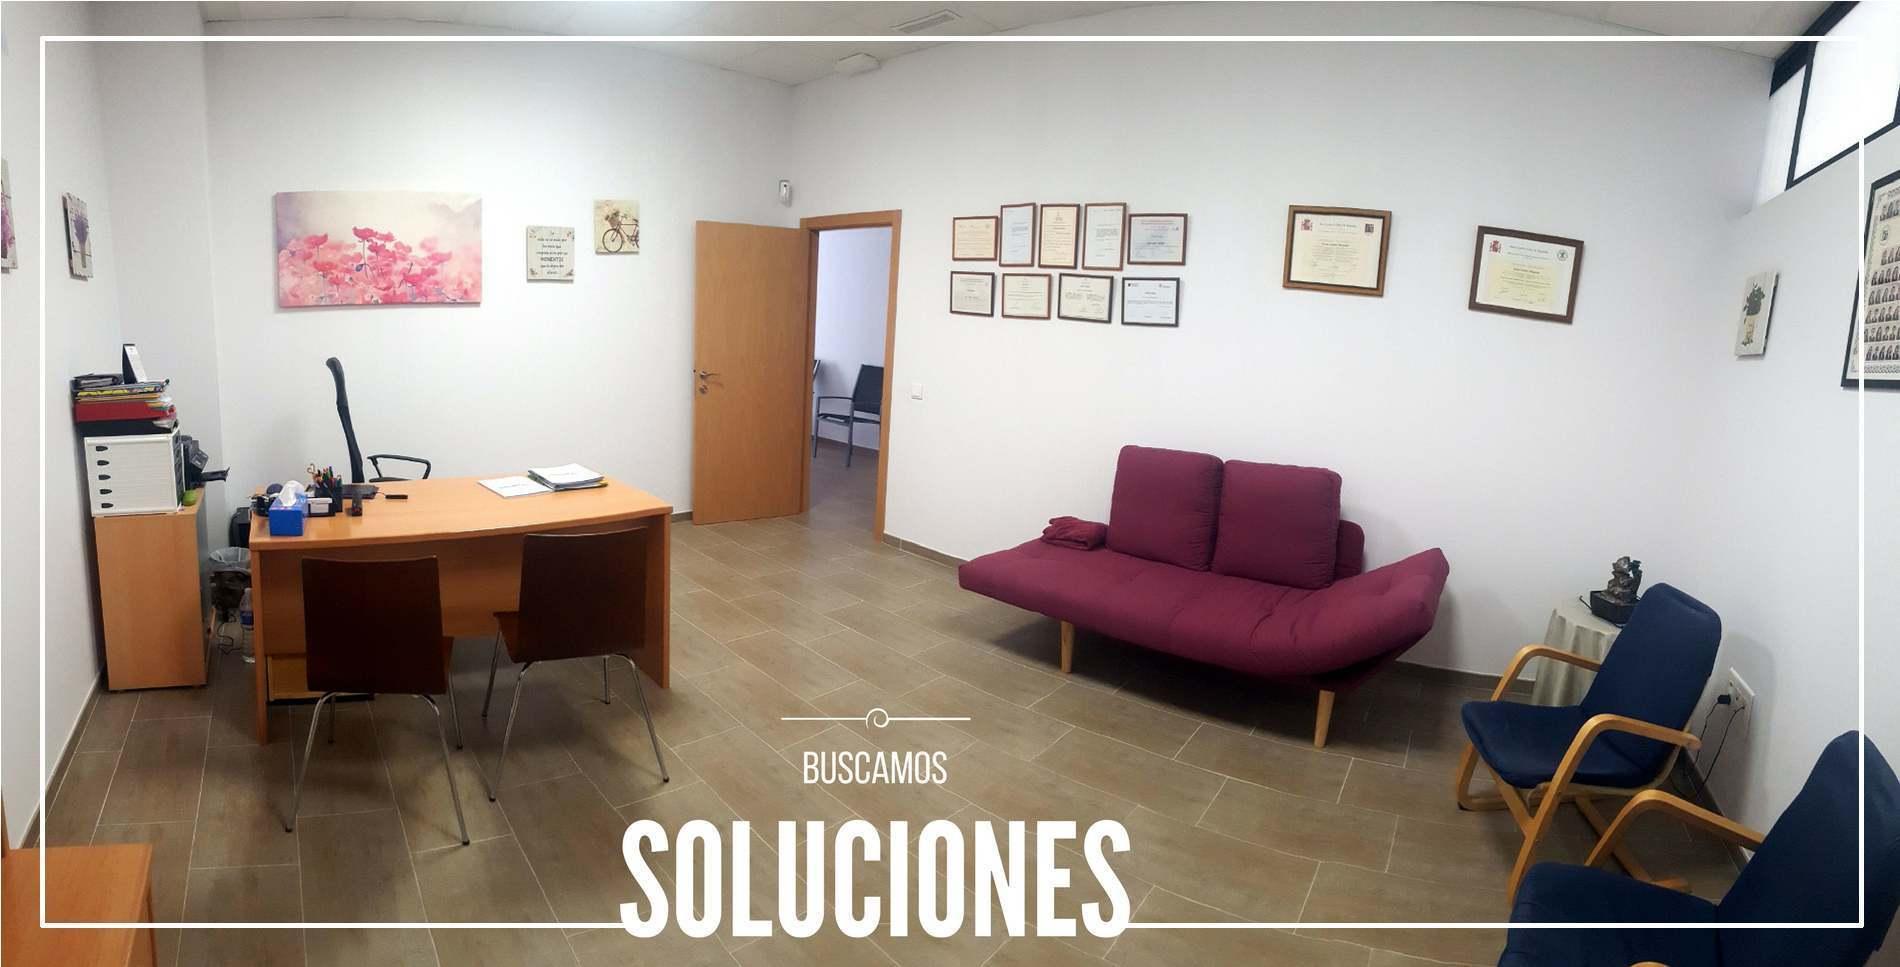 Centro de Psicología en Castellón